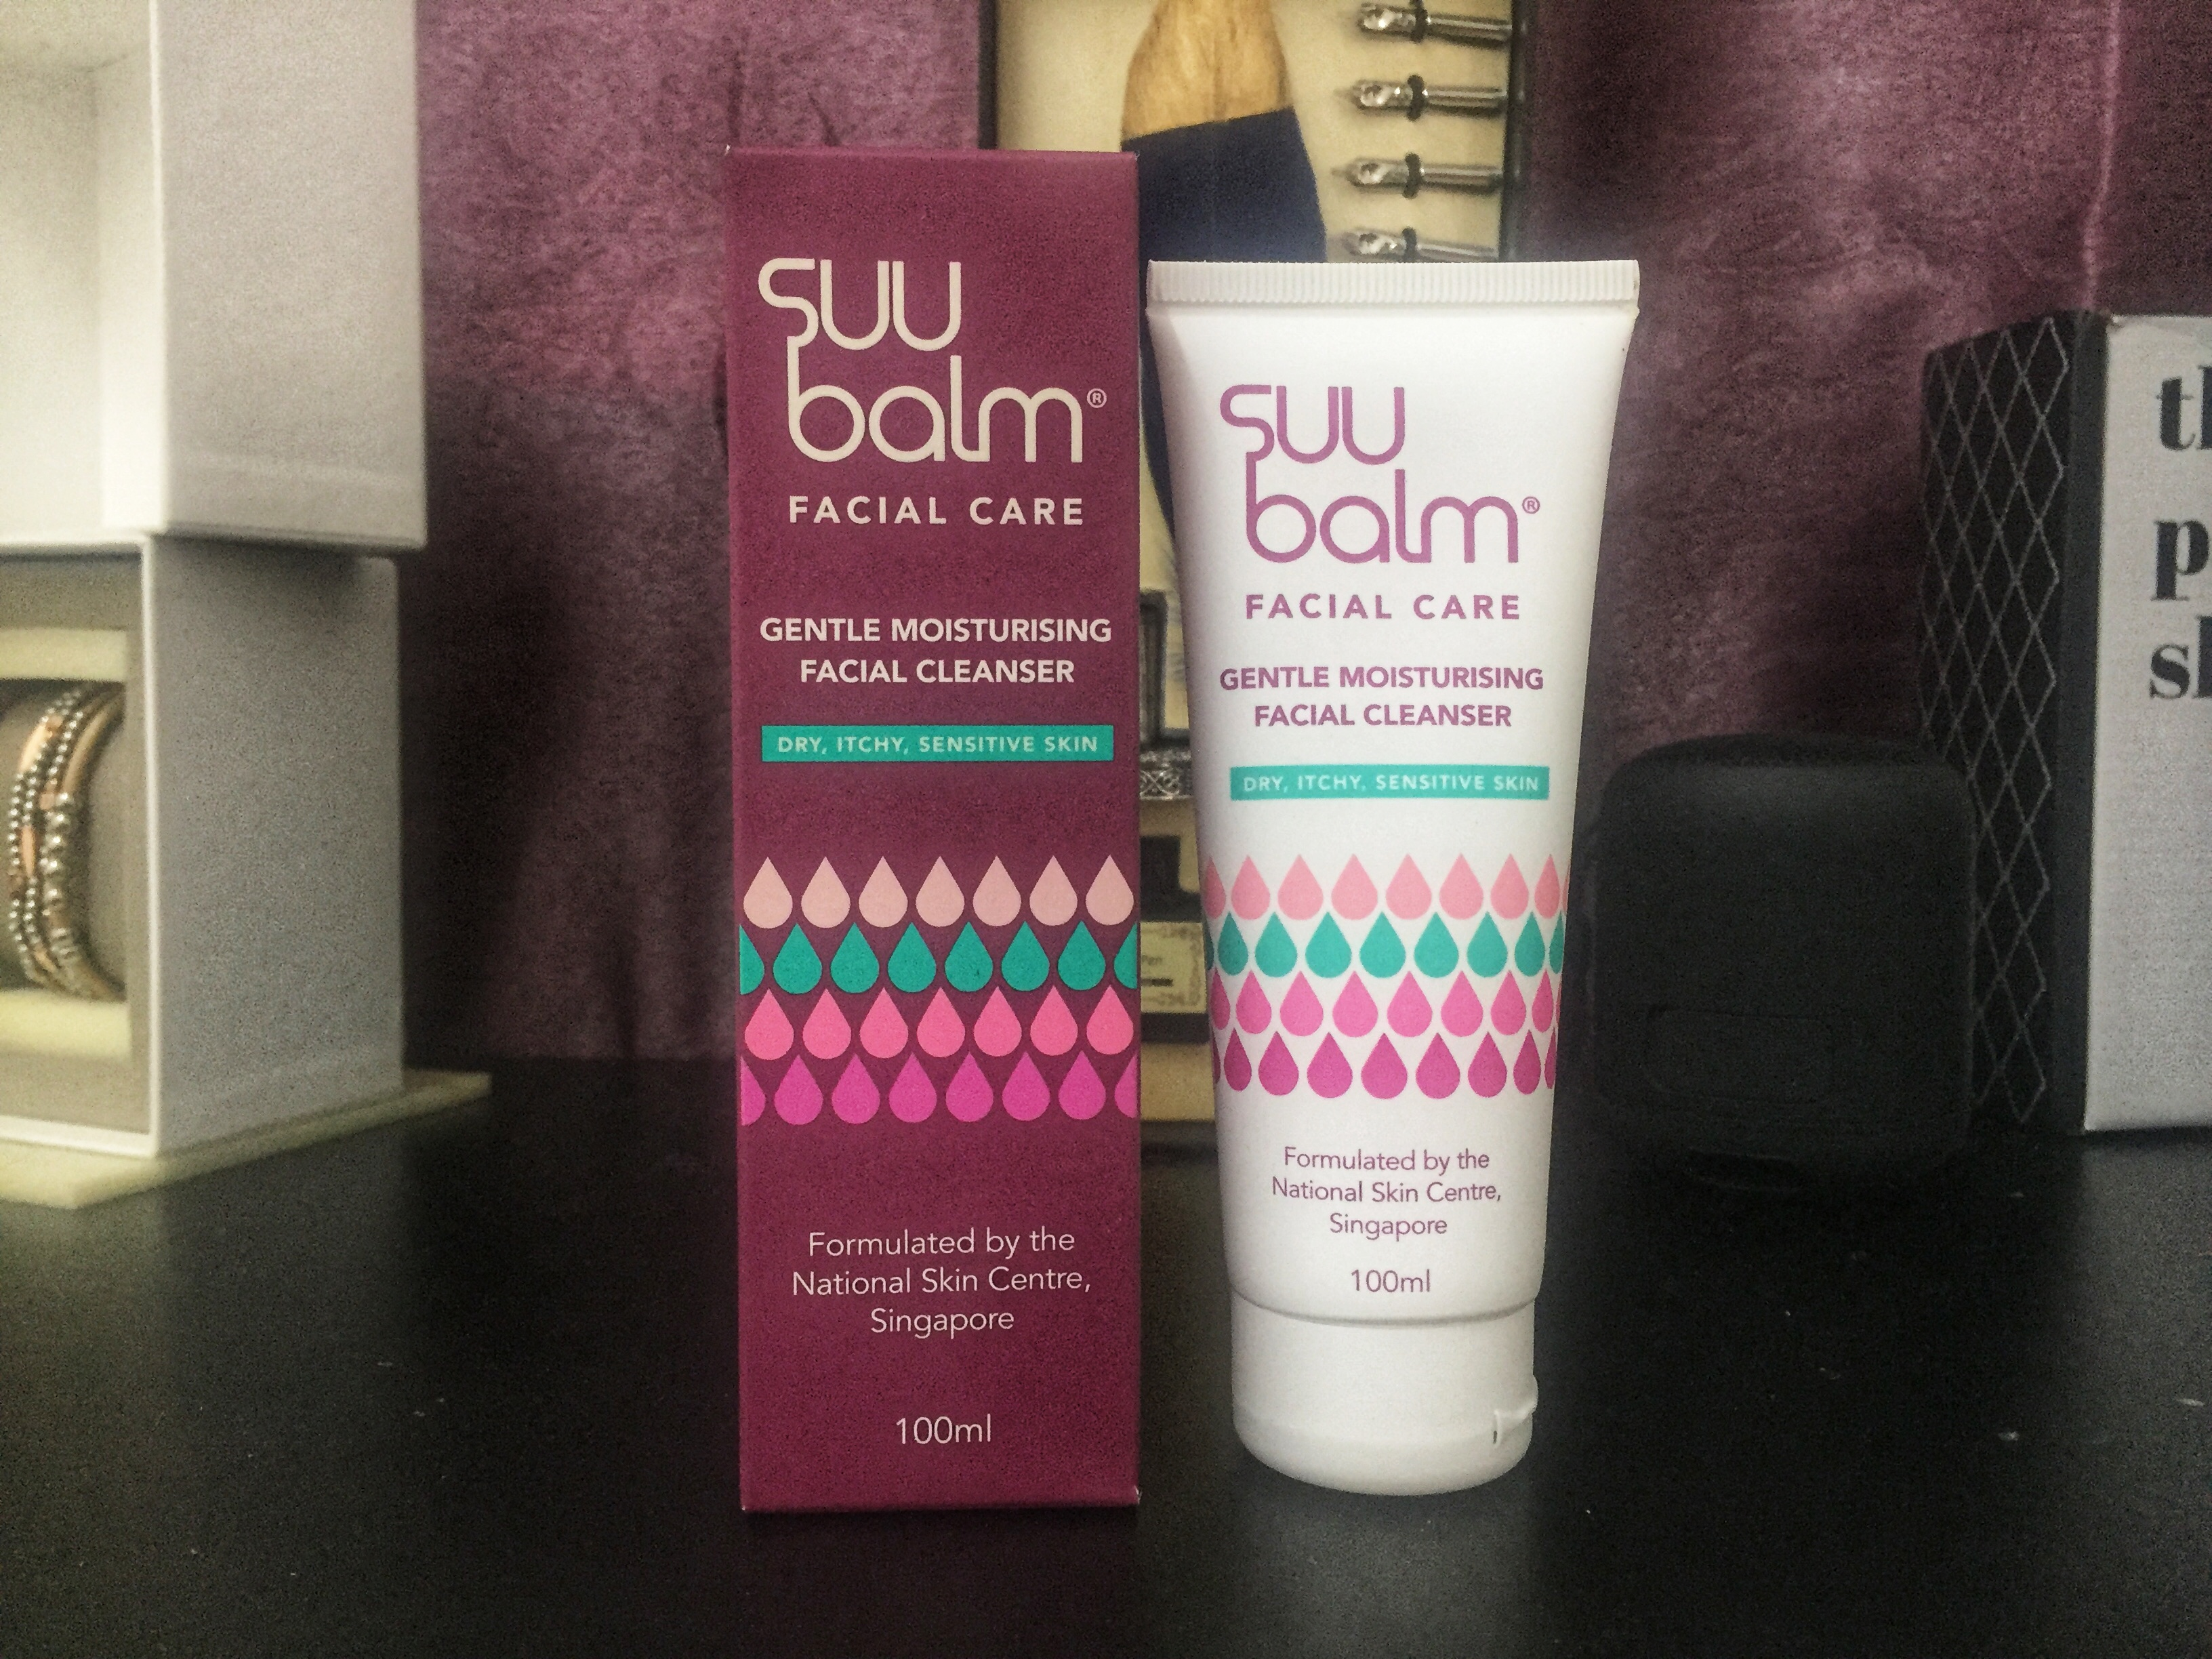 REVIEW | Suu Balm Facial Care Gentle Moisturising Facial Cleanser